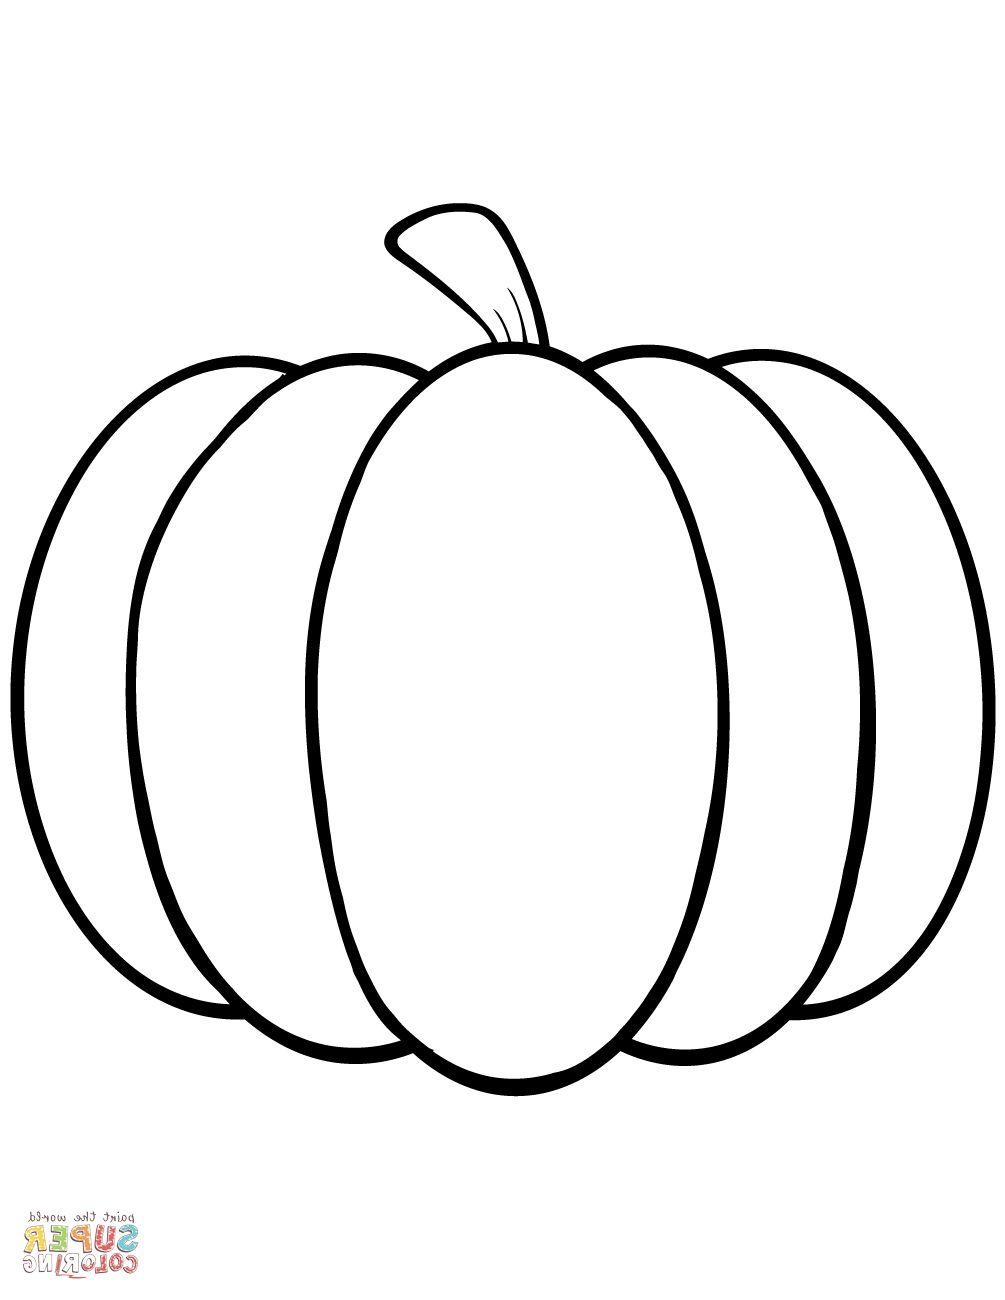 Pumpkin Coloring Pages   Coloring Page   Pinterest   Pumpkin - Free Printable Pumpkin Coloring Pages